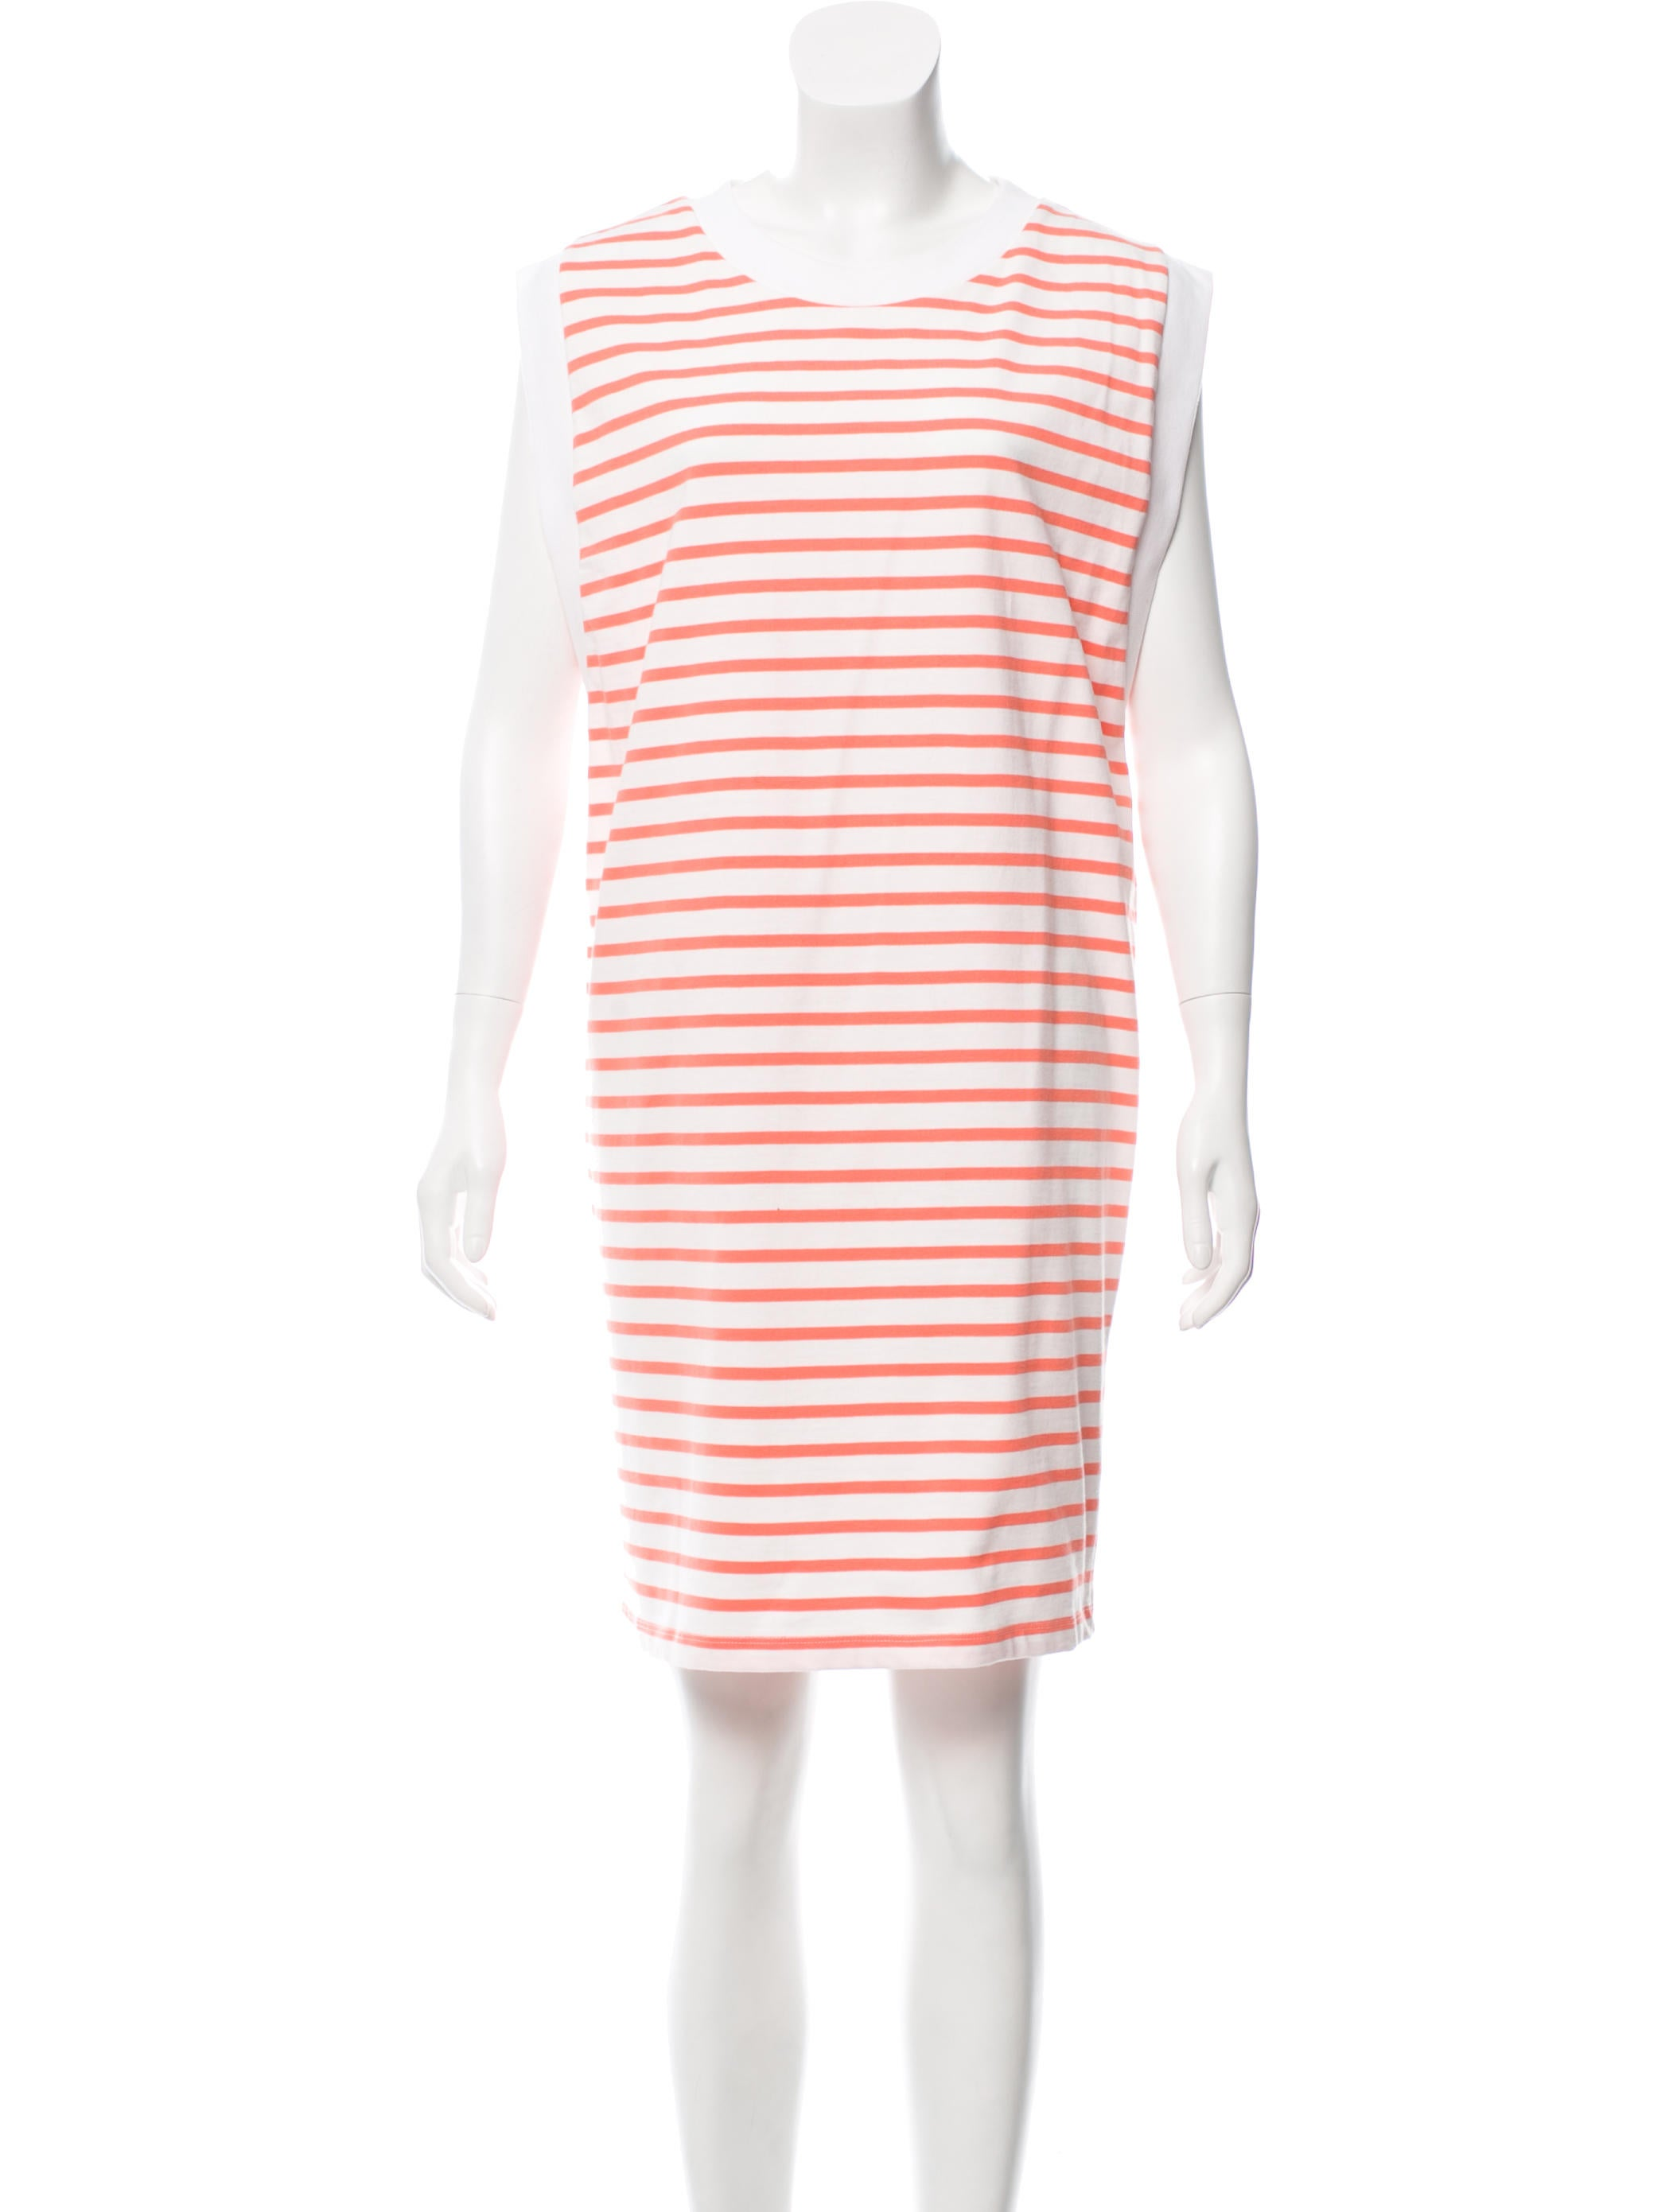 Petit bateau sleeveless striped dress clothing for Petit bateau striped shirt